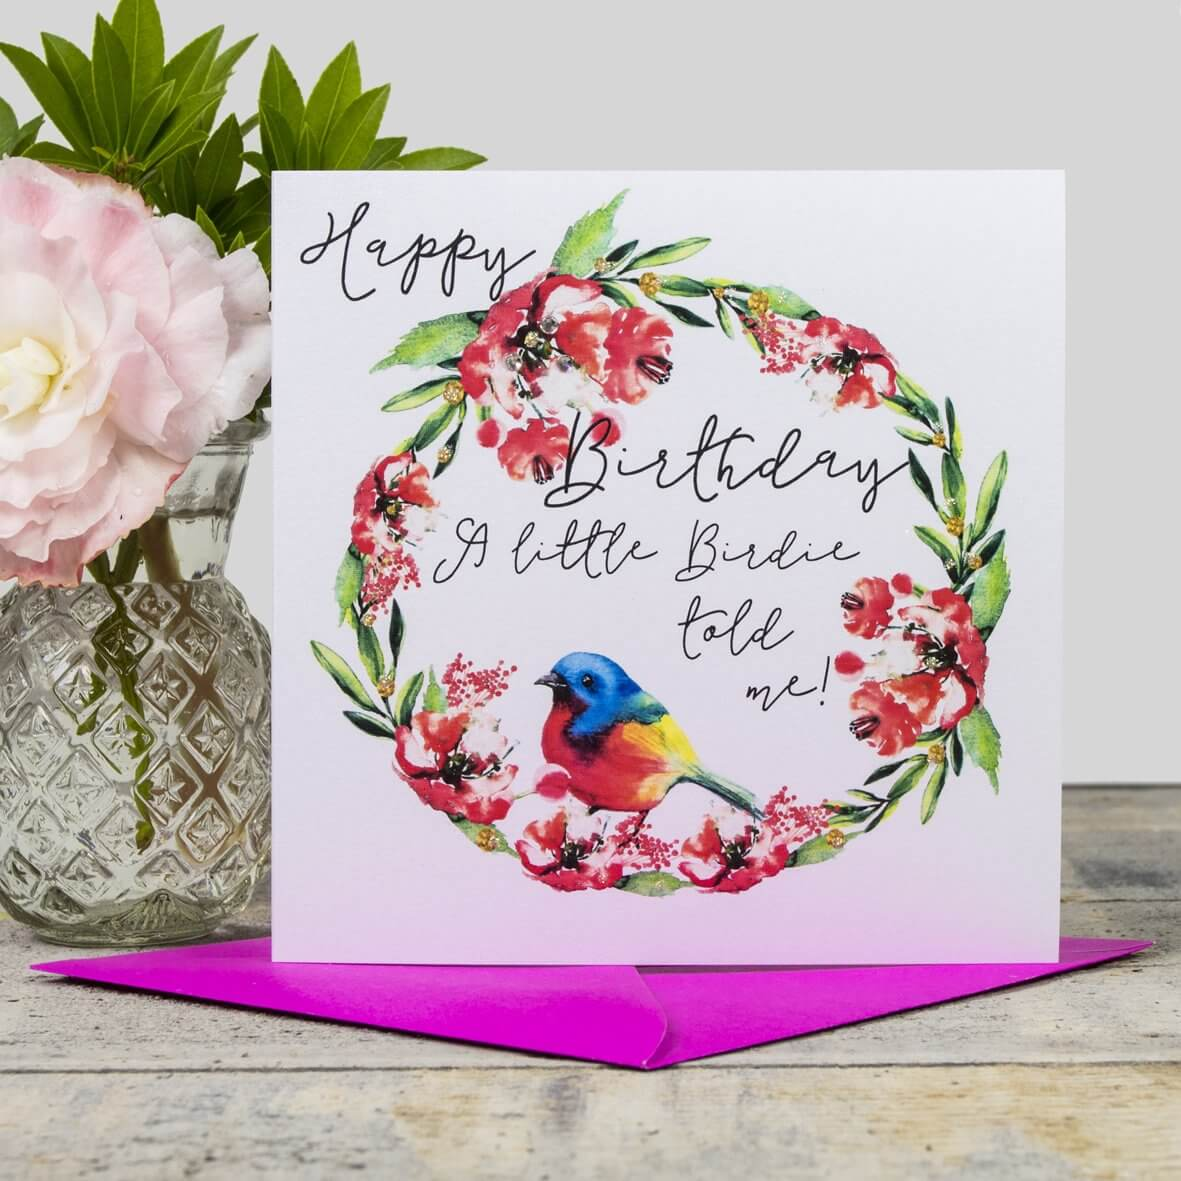 Happy Birthday Card - a little birdie told me